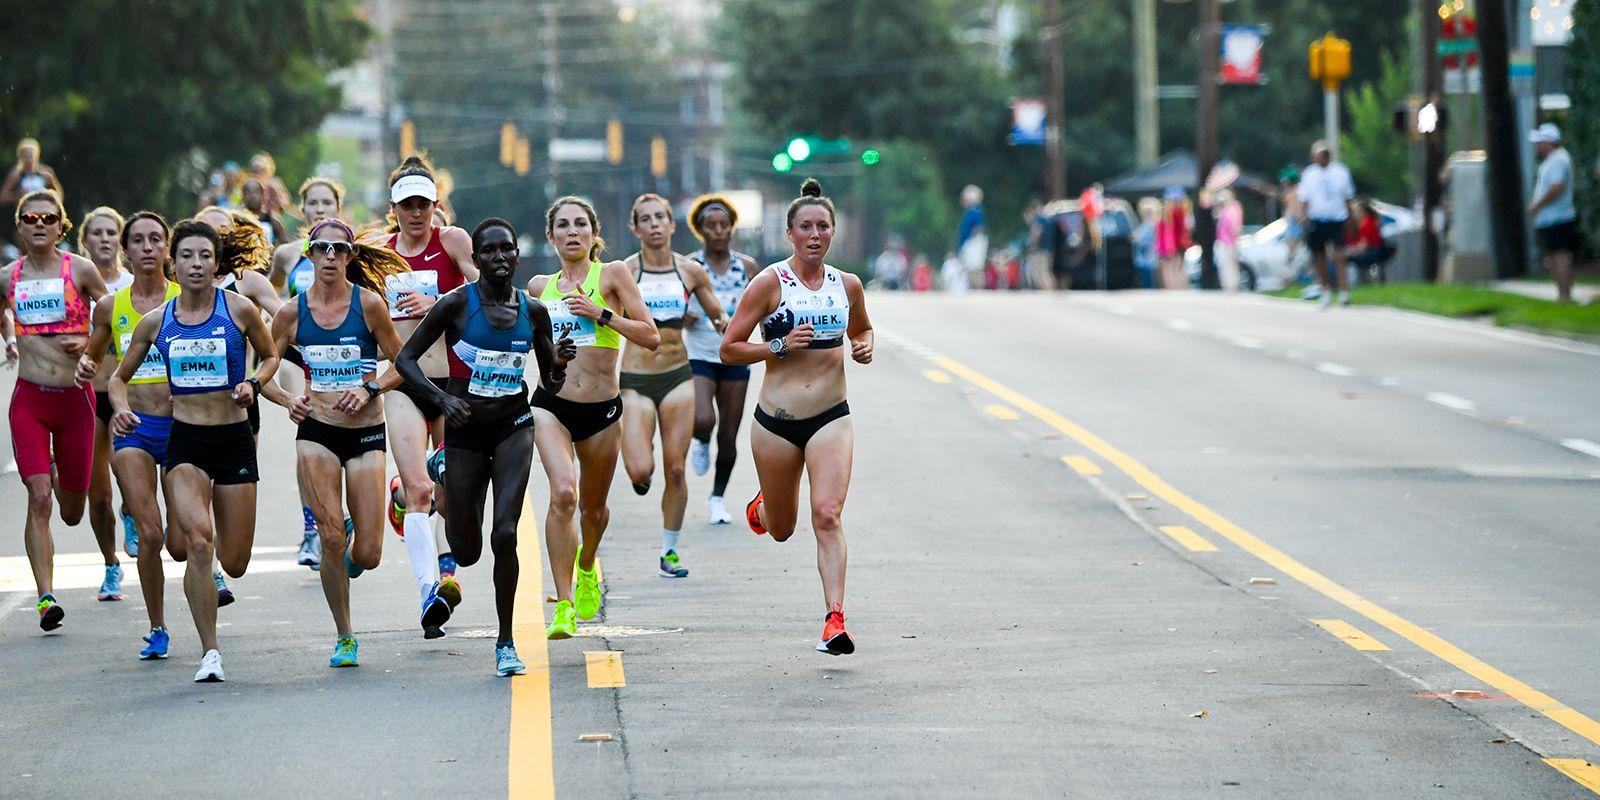 2018 New York Marathon is the race of a lifetime for Allie Kieffer